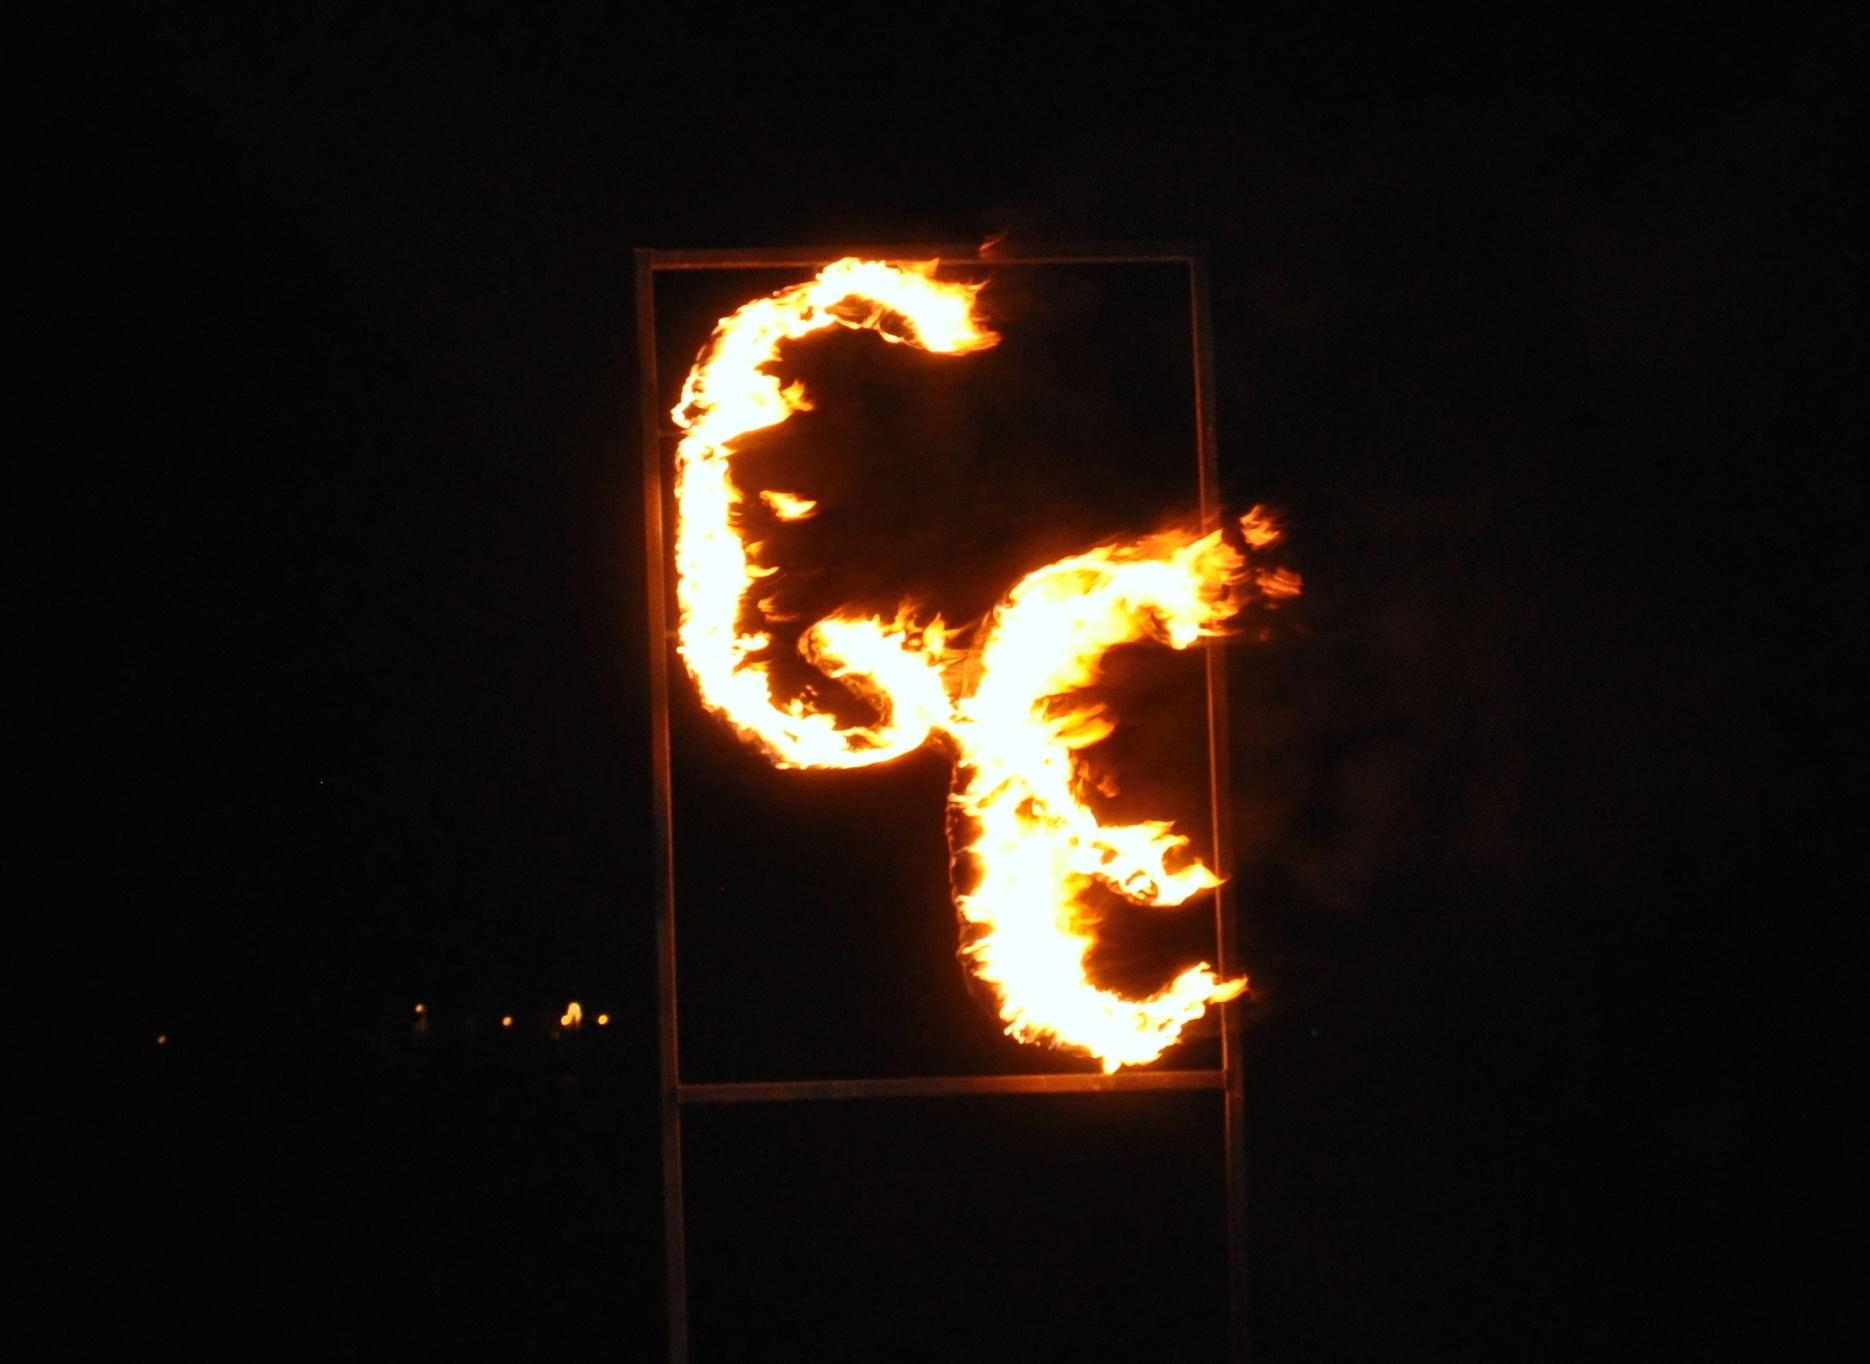 Flaming_CC_cropped.jpeg